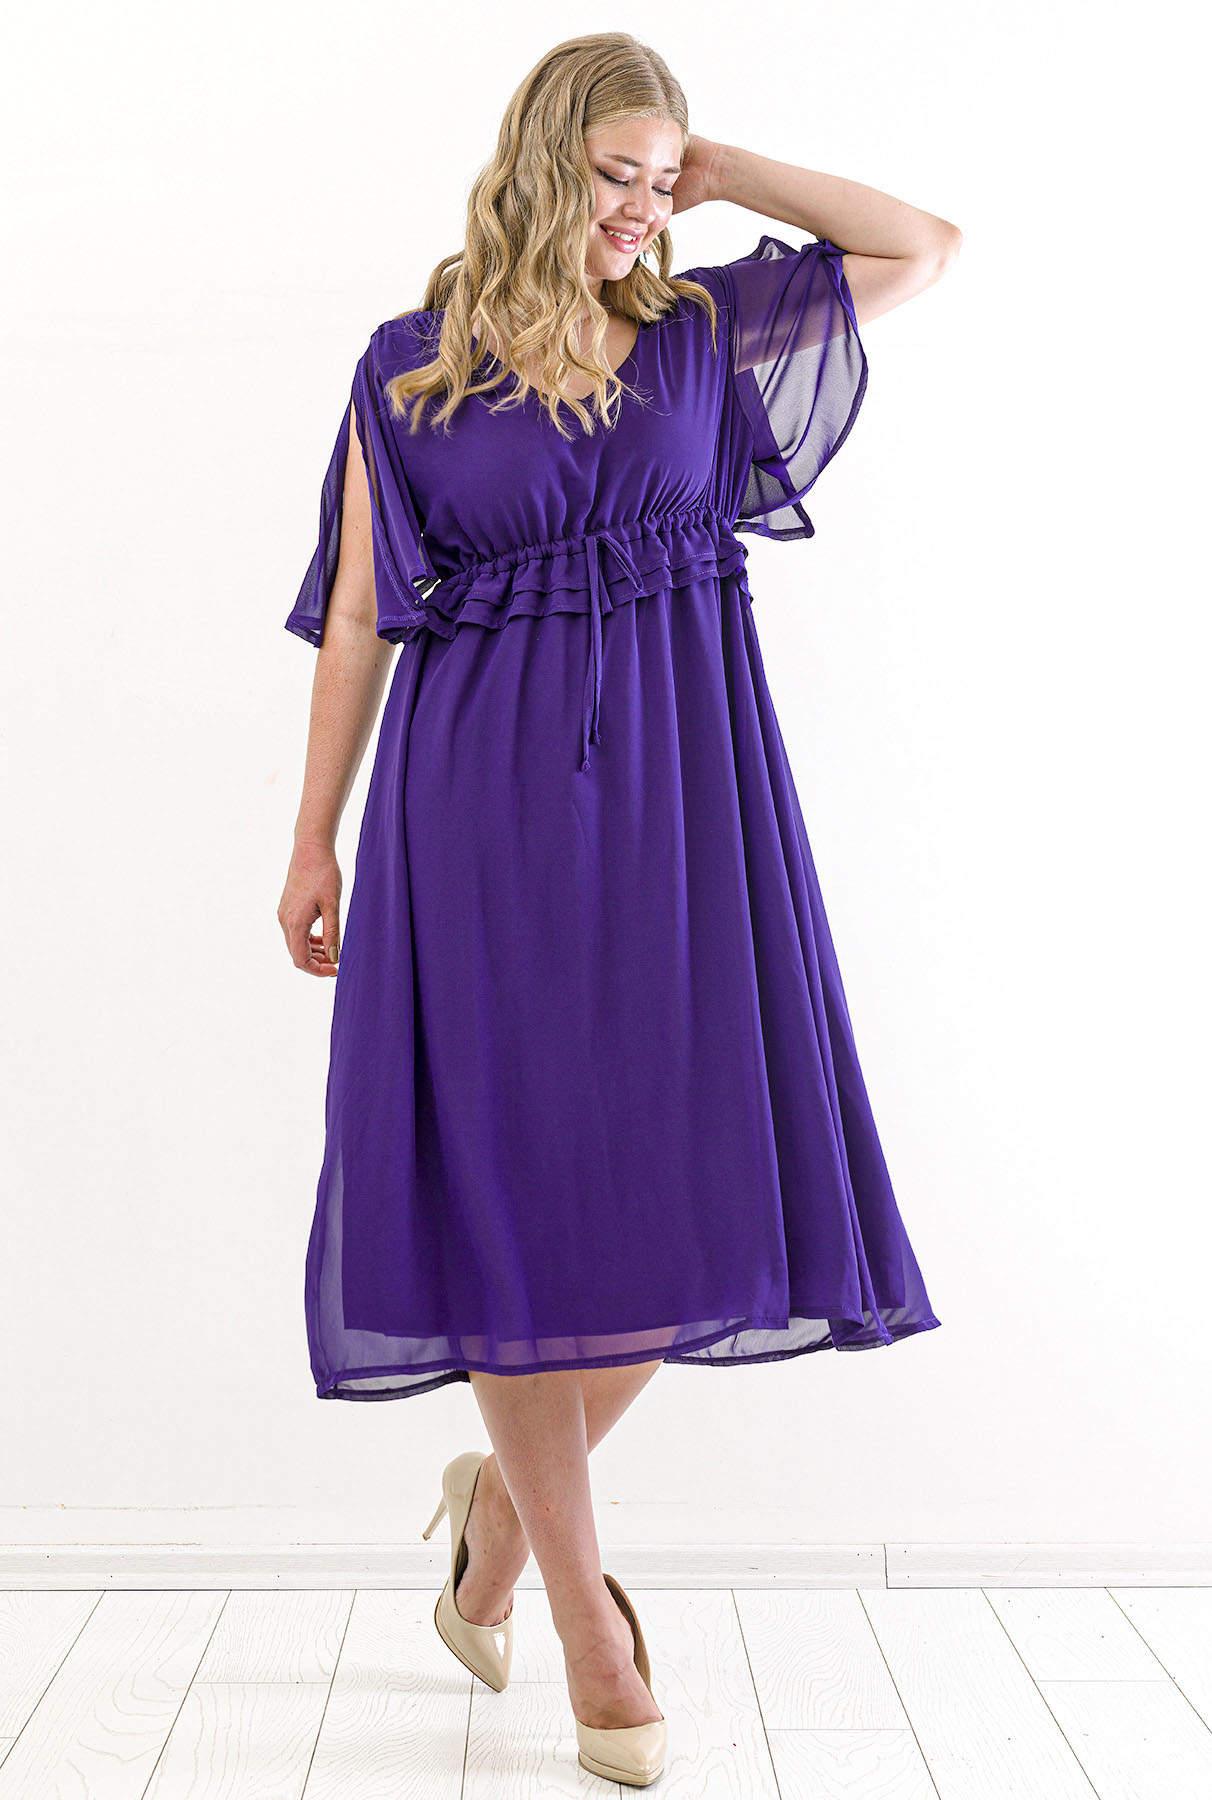 Violett Chiffon Kleid